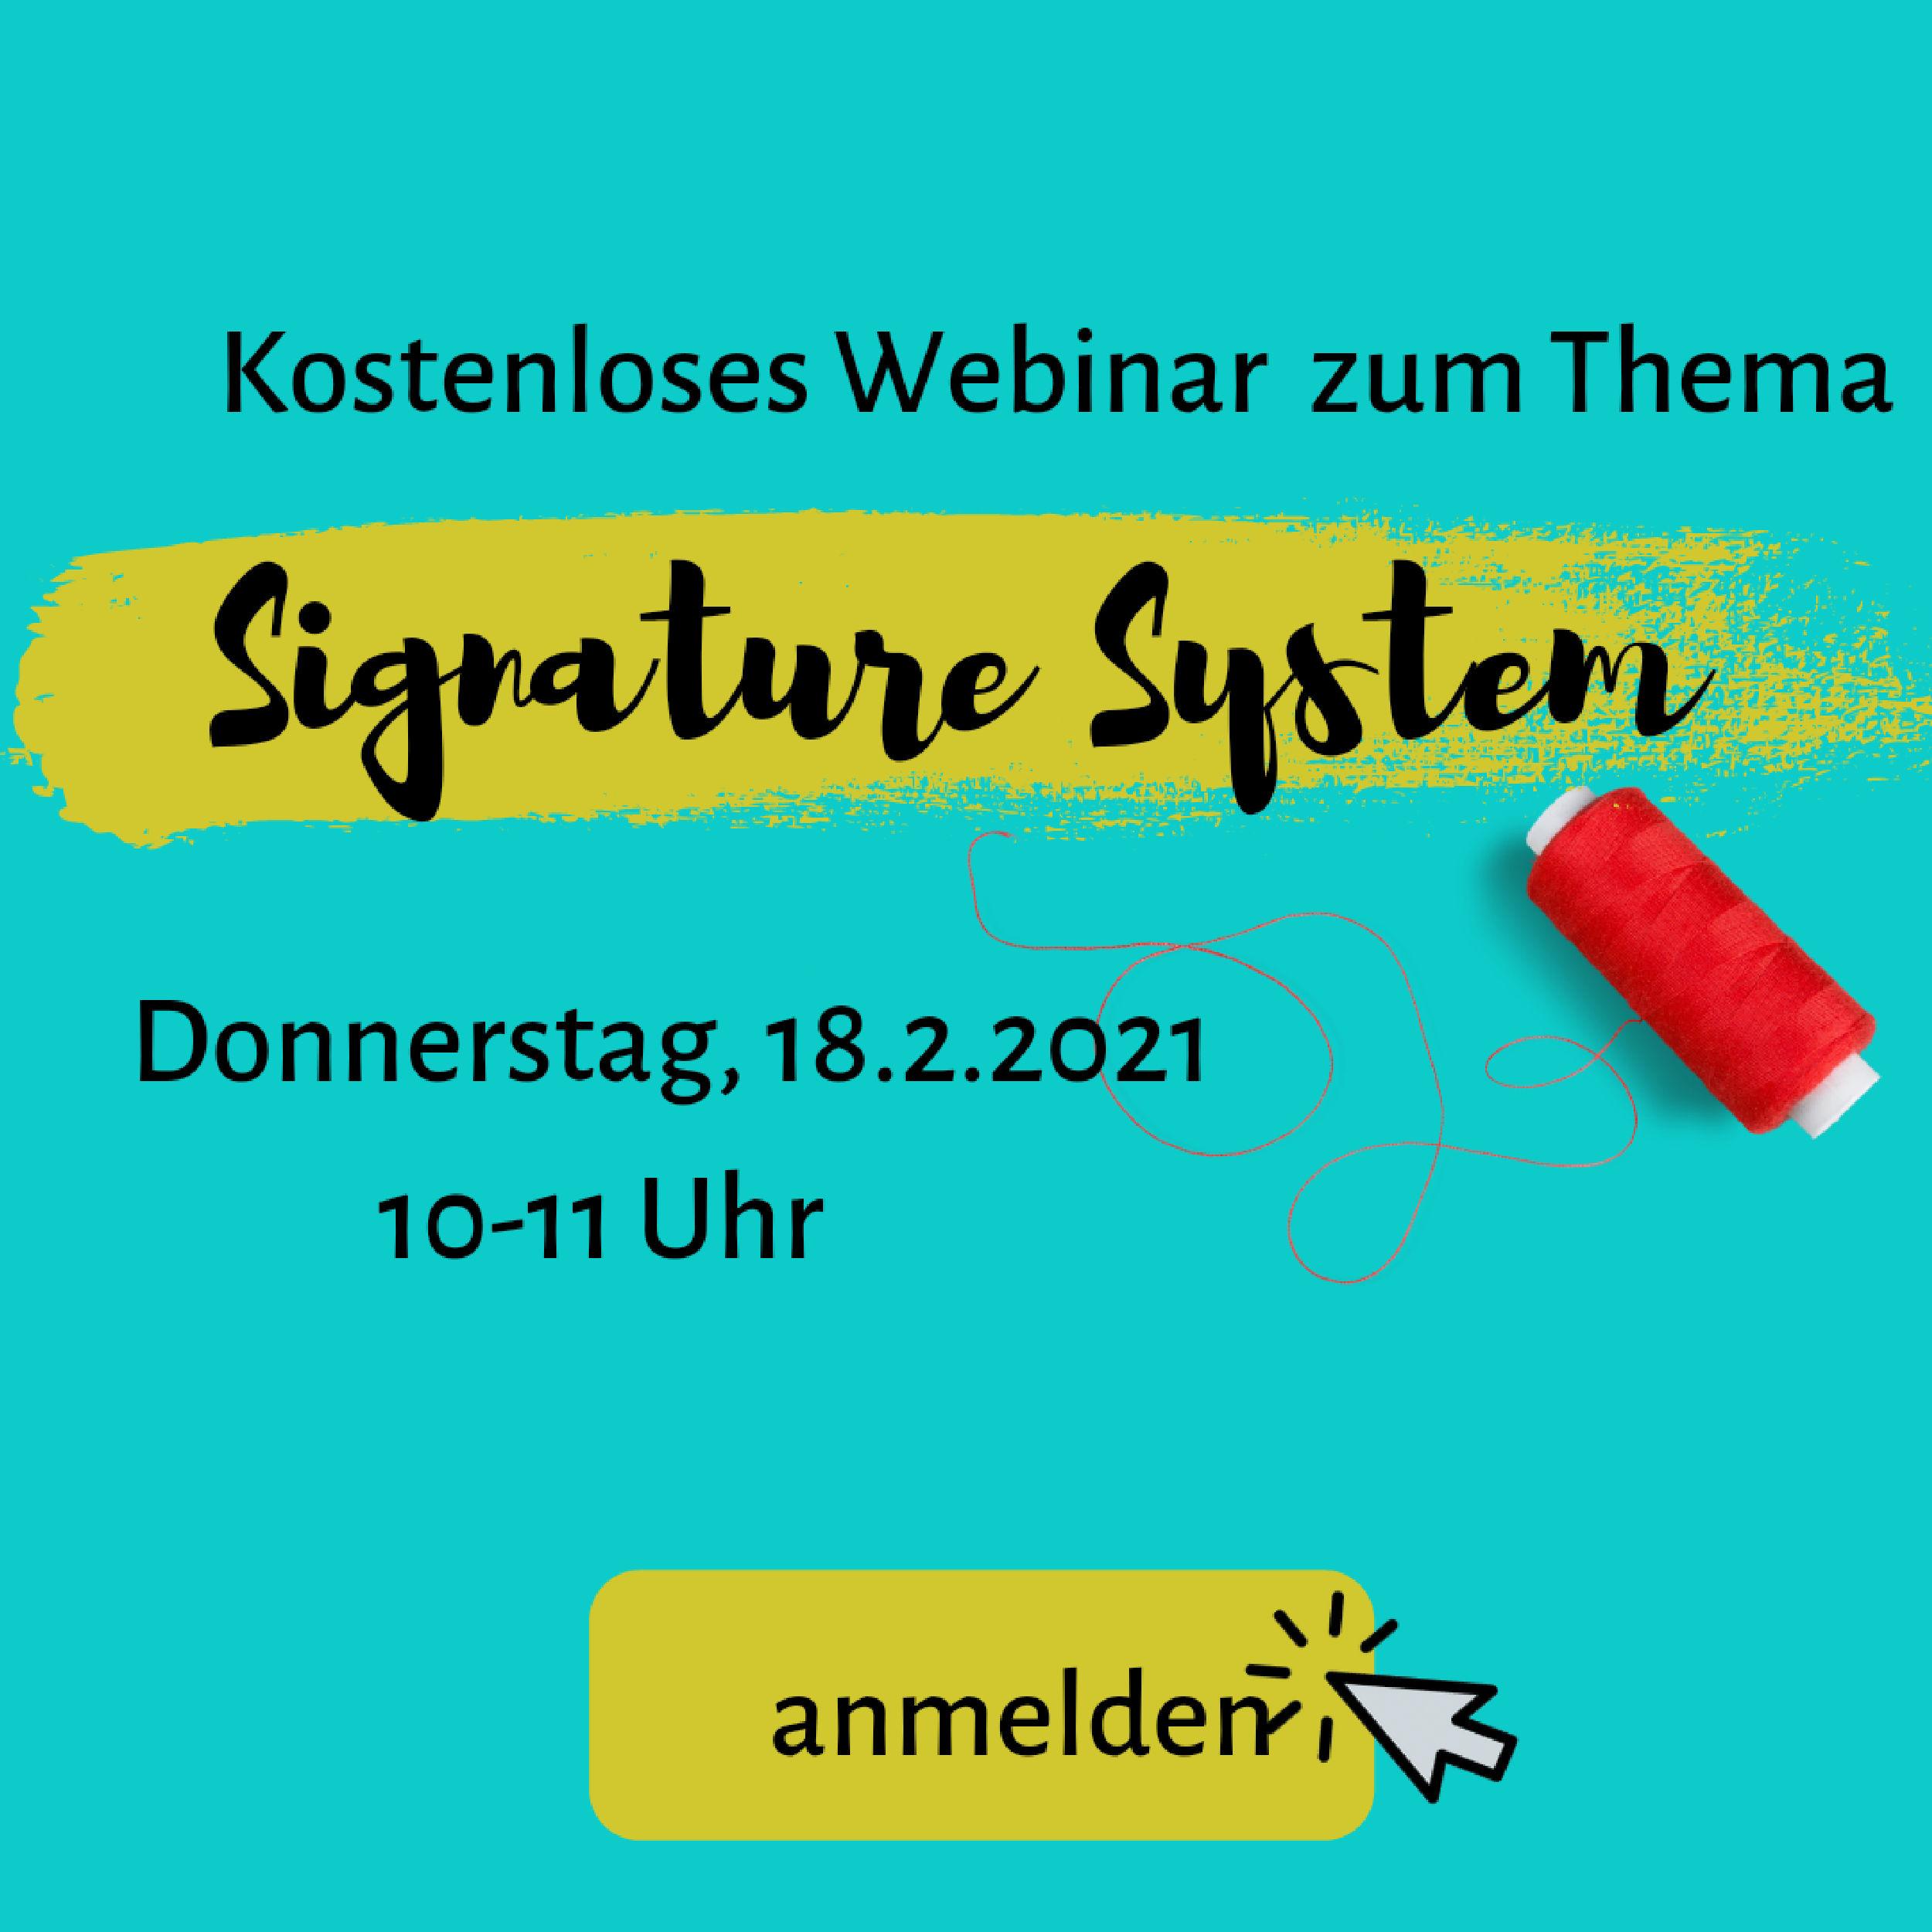 Einladung zum Webinar Signatur System